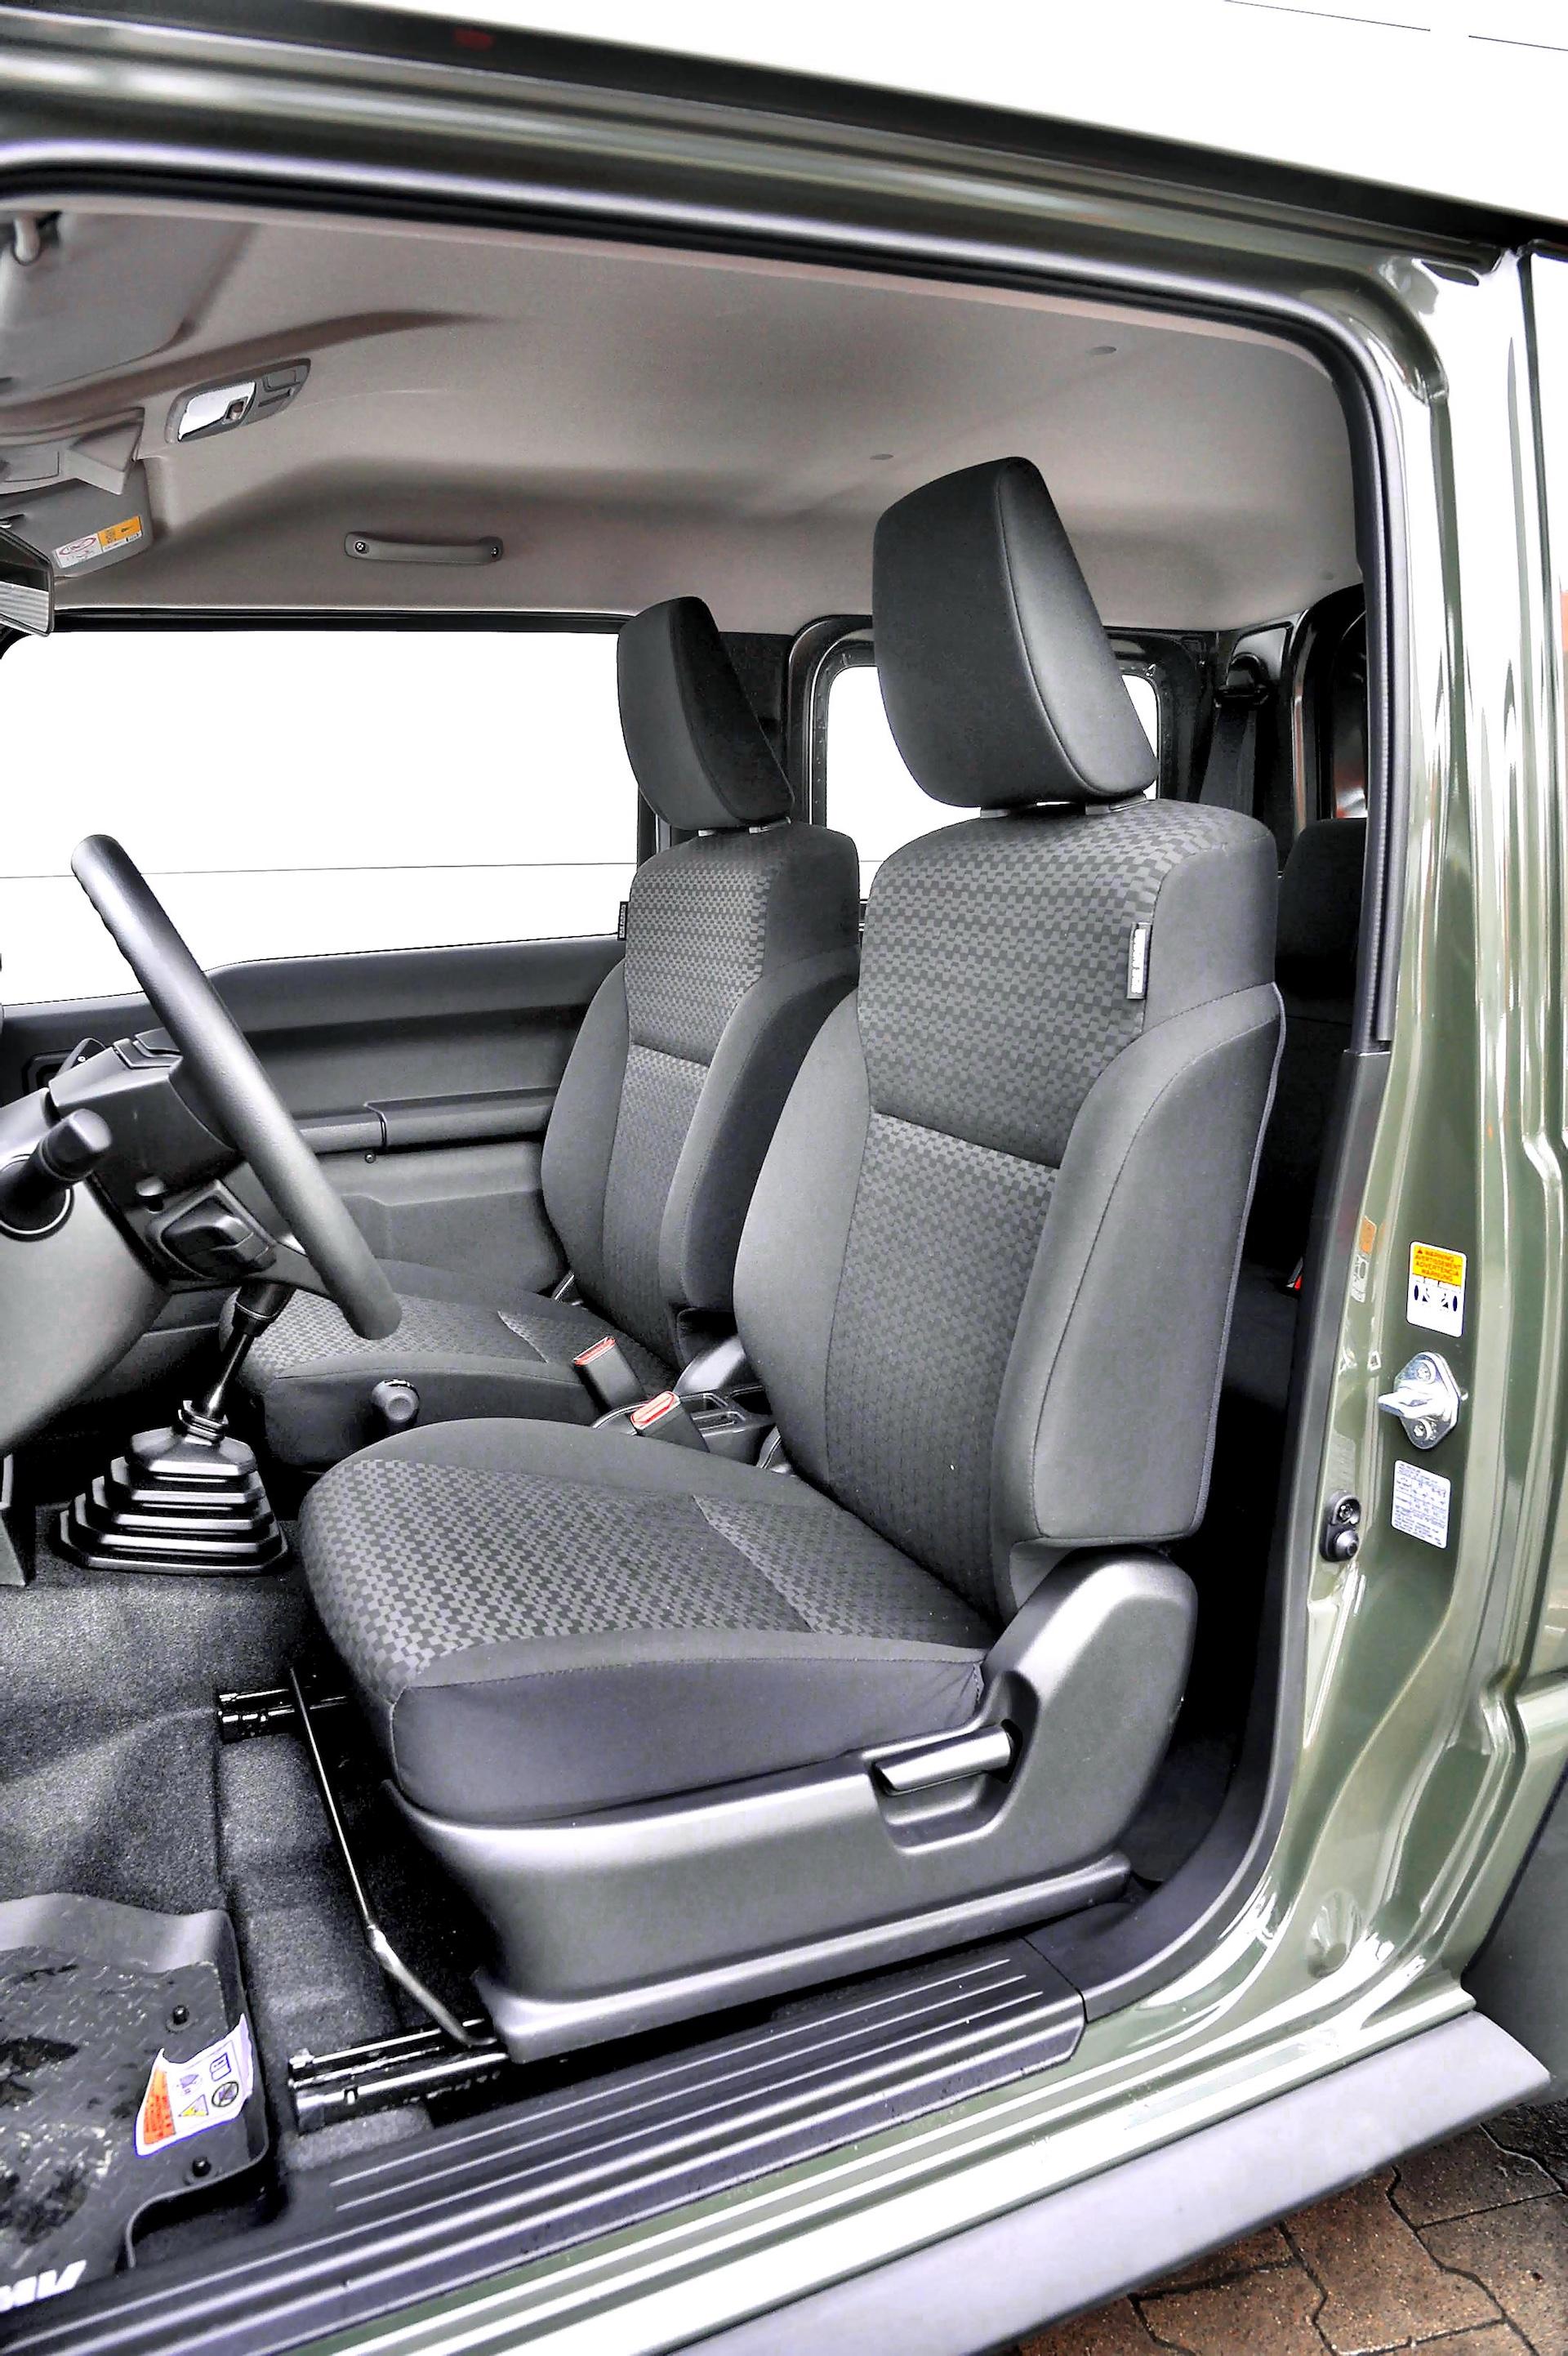 2018 Suzuki Jimny_013